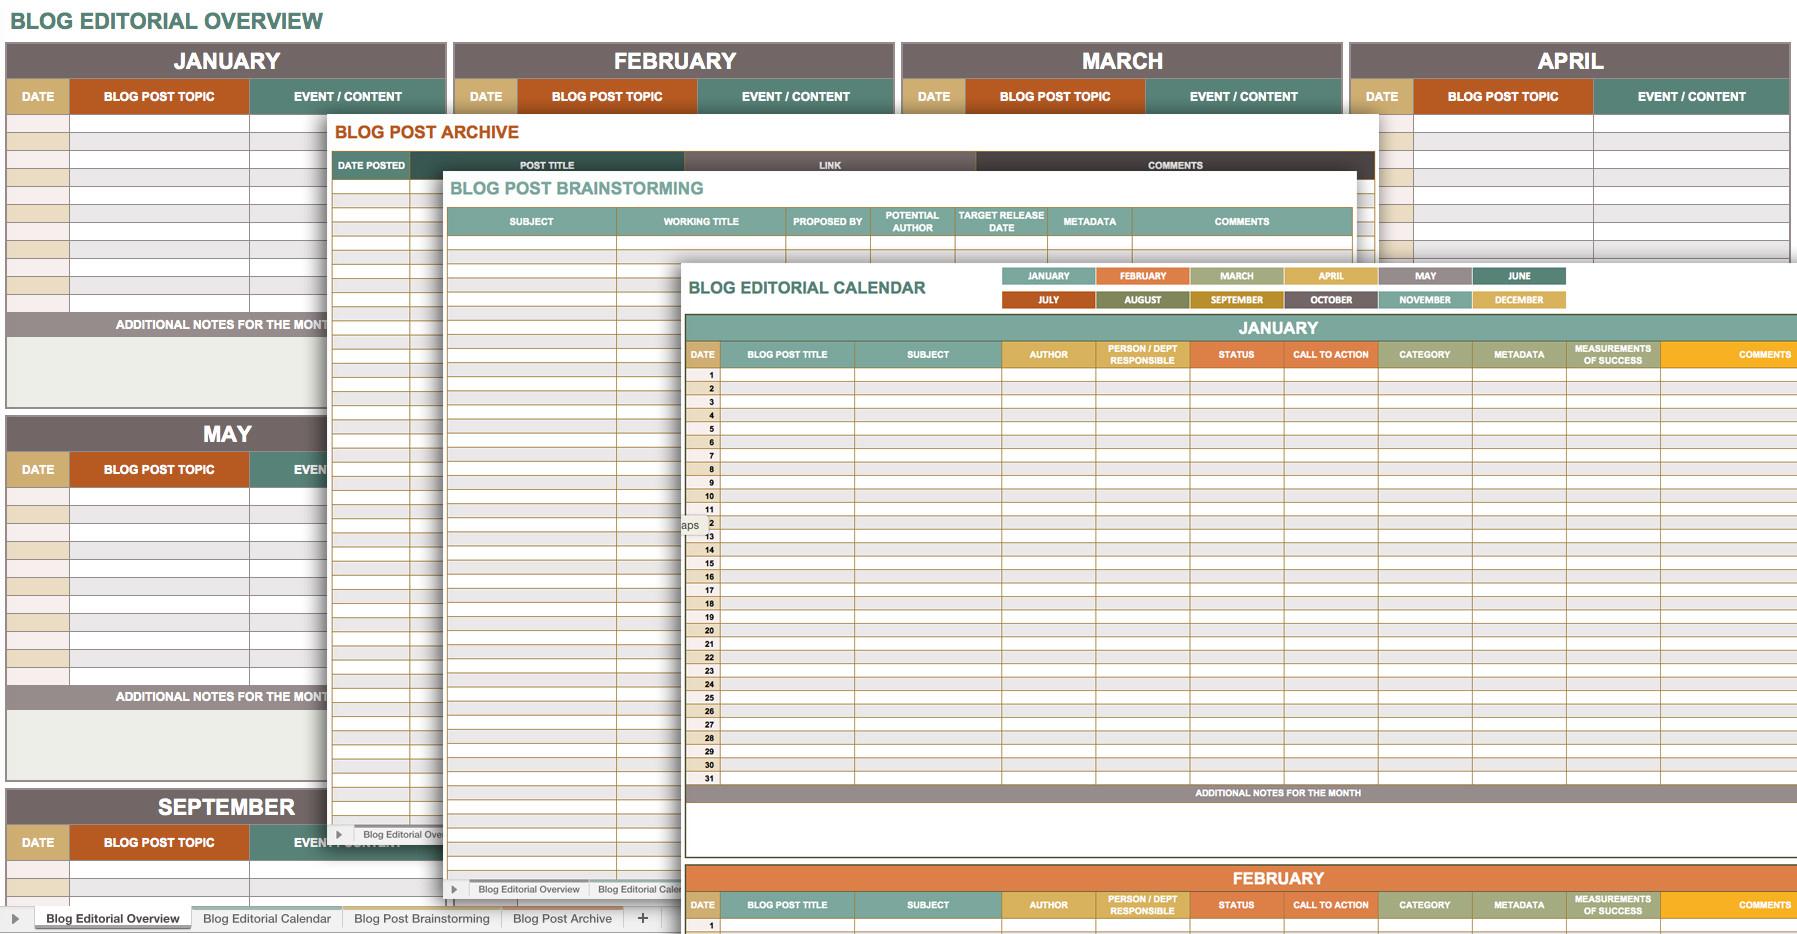 Online Spreadsheet Viewer Spreadsheet Downloa Online Xls Viewer Free Download Online